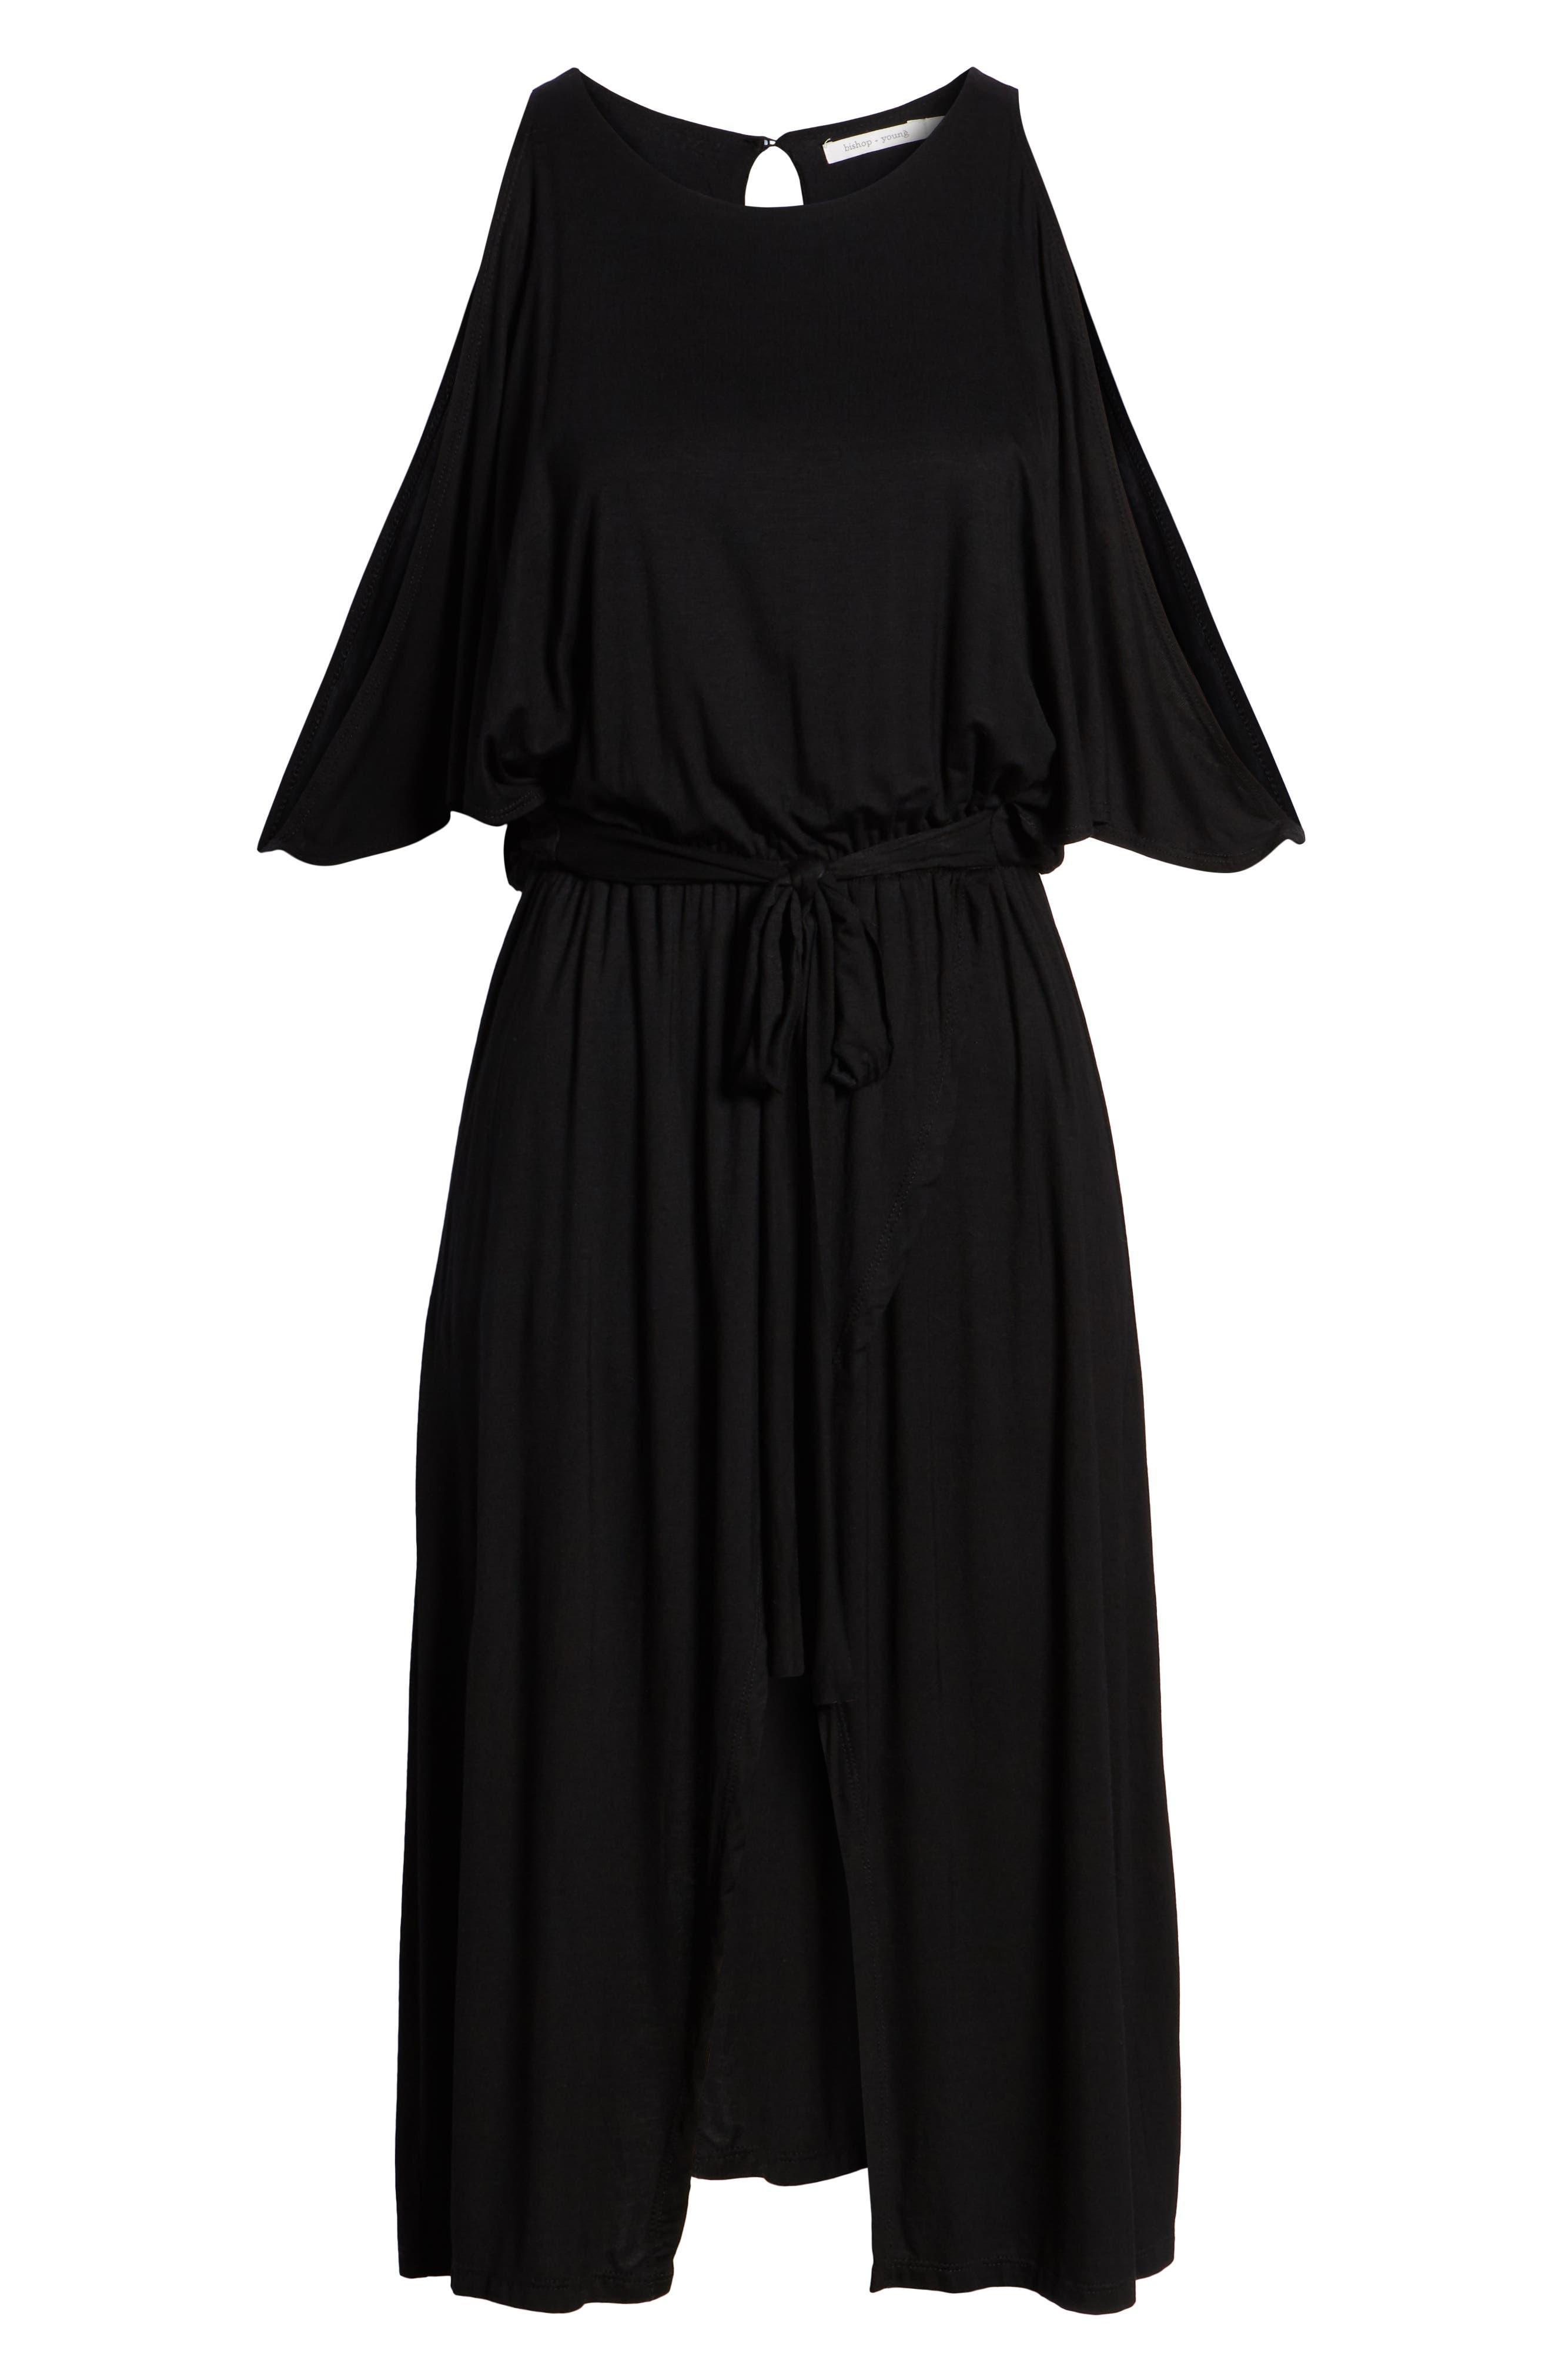 Bishop + Young Slit Sleeve Wrap Style Dress,                             Alternate thumbnail 6, color,                             Black